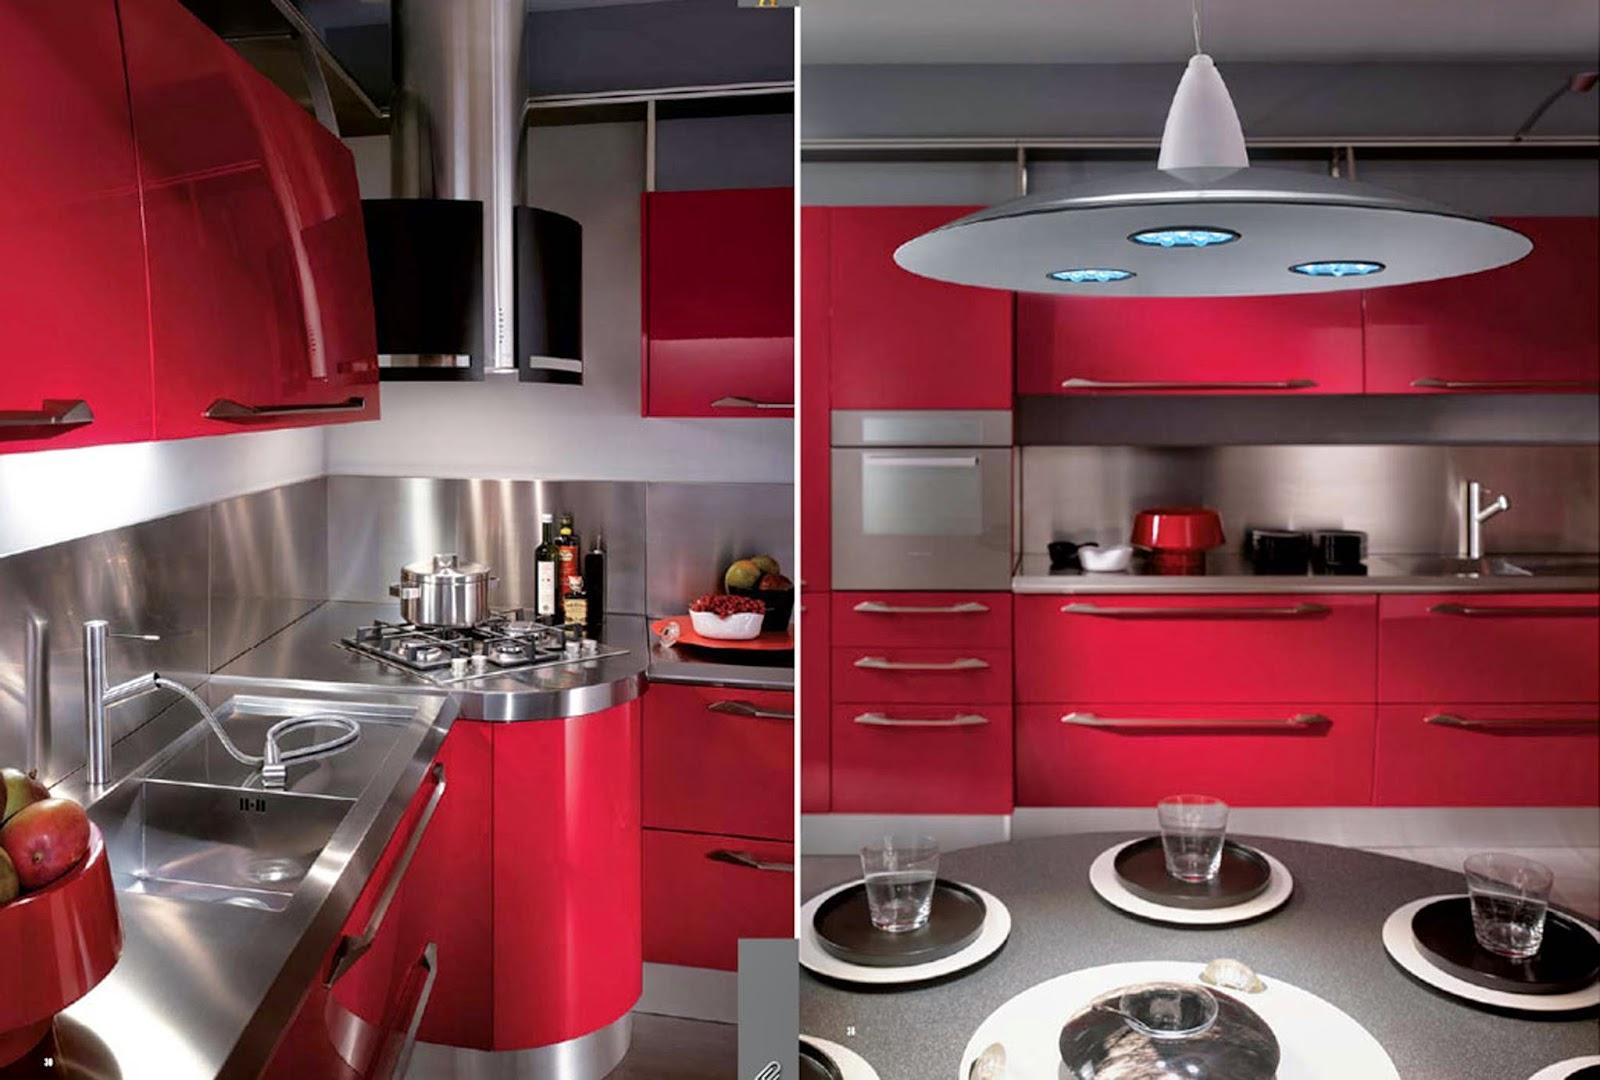 Dapur kitchen set